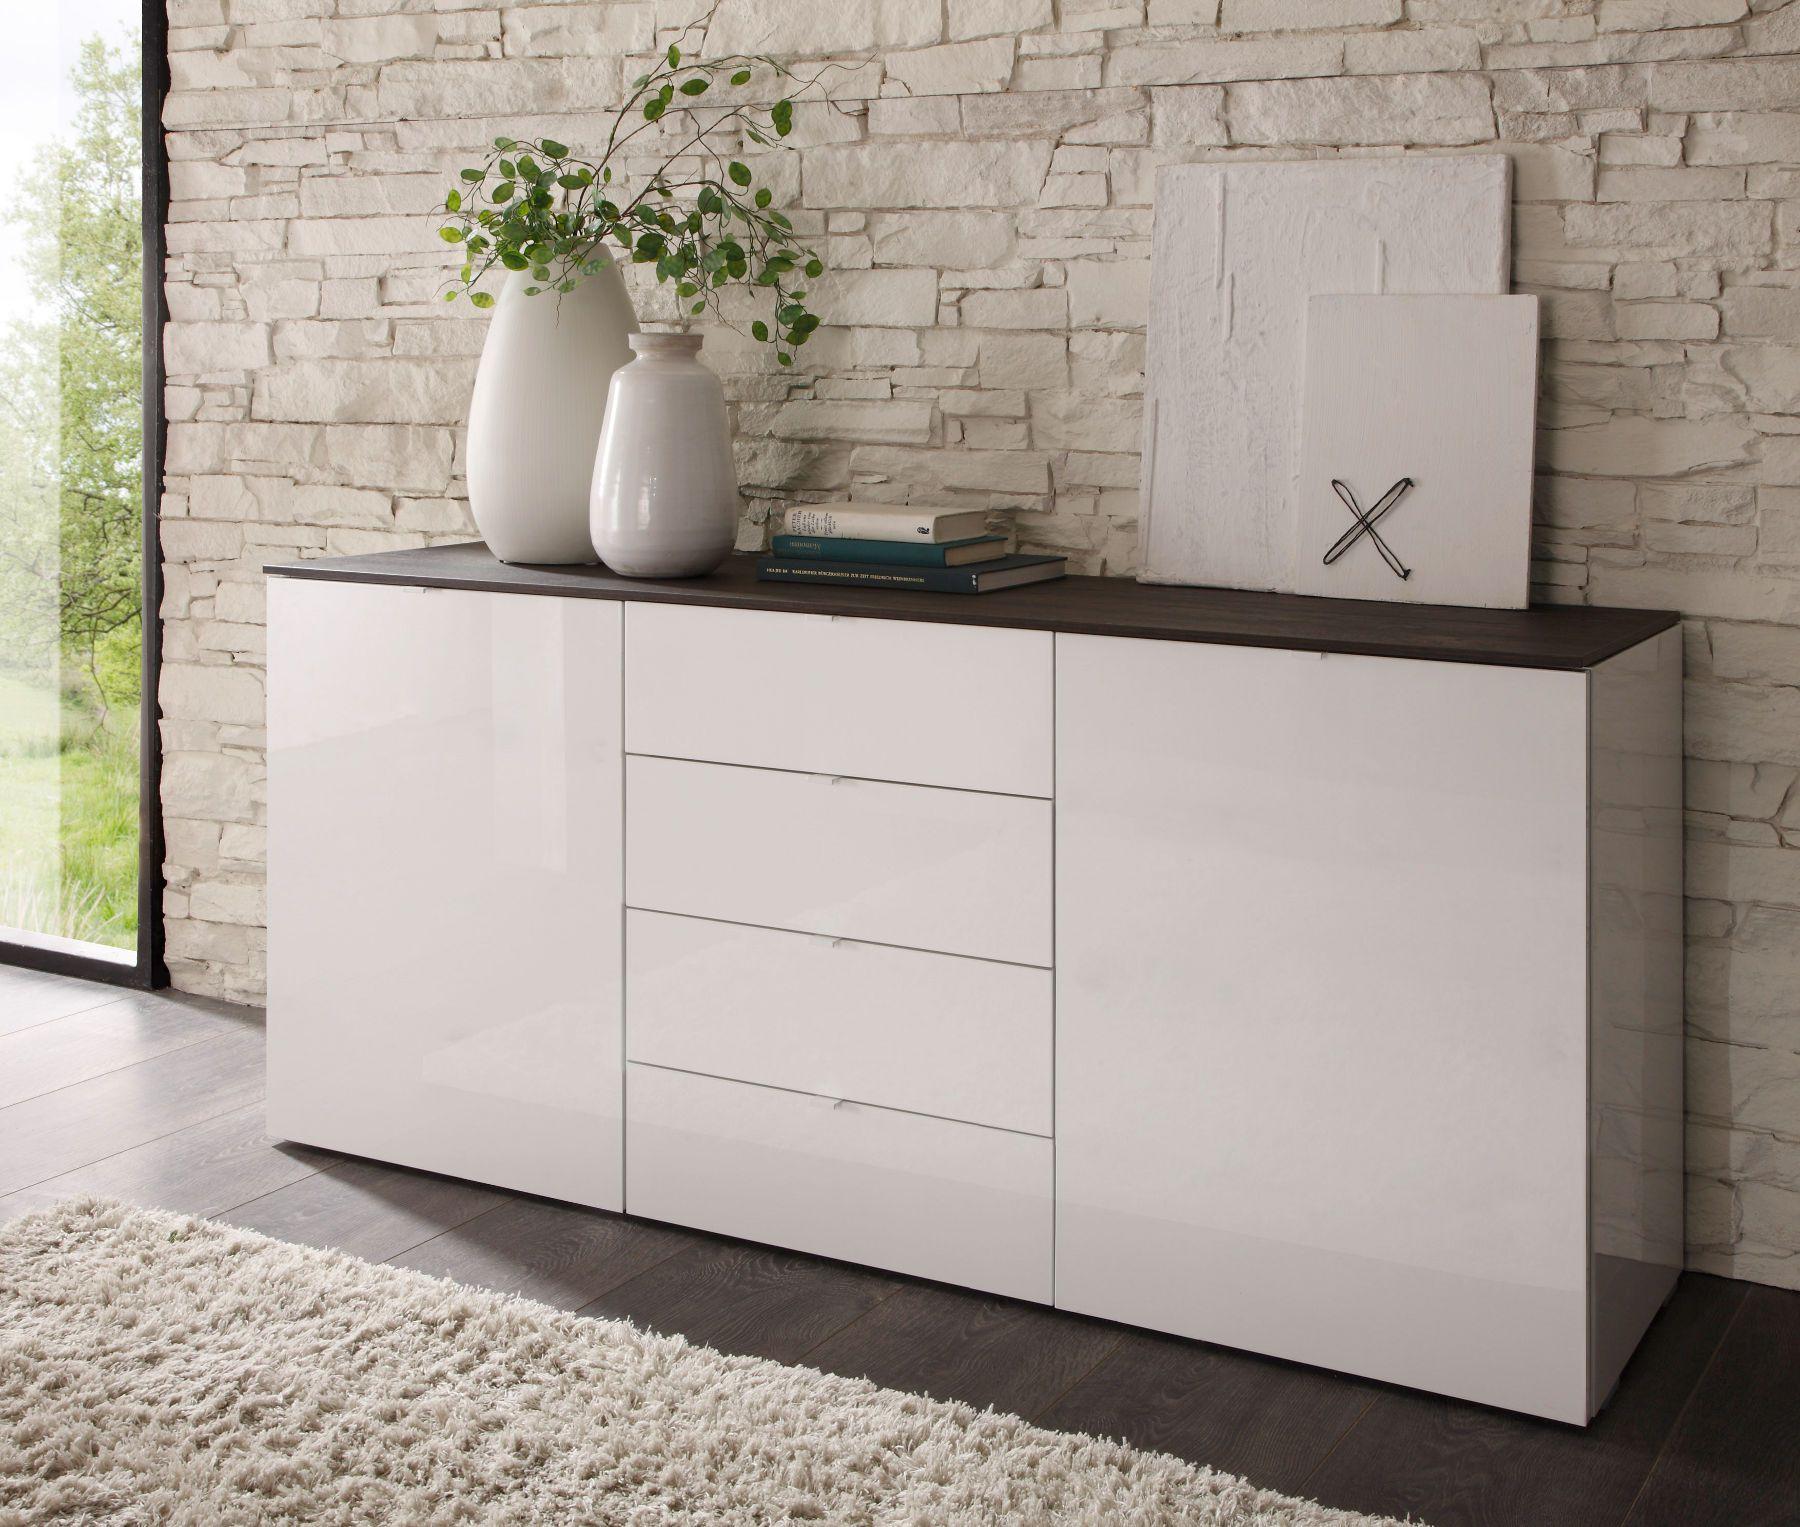 sideboard hochglanz grau Decor, Home decor, Ikea